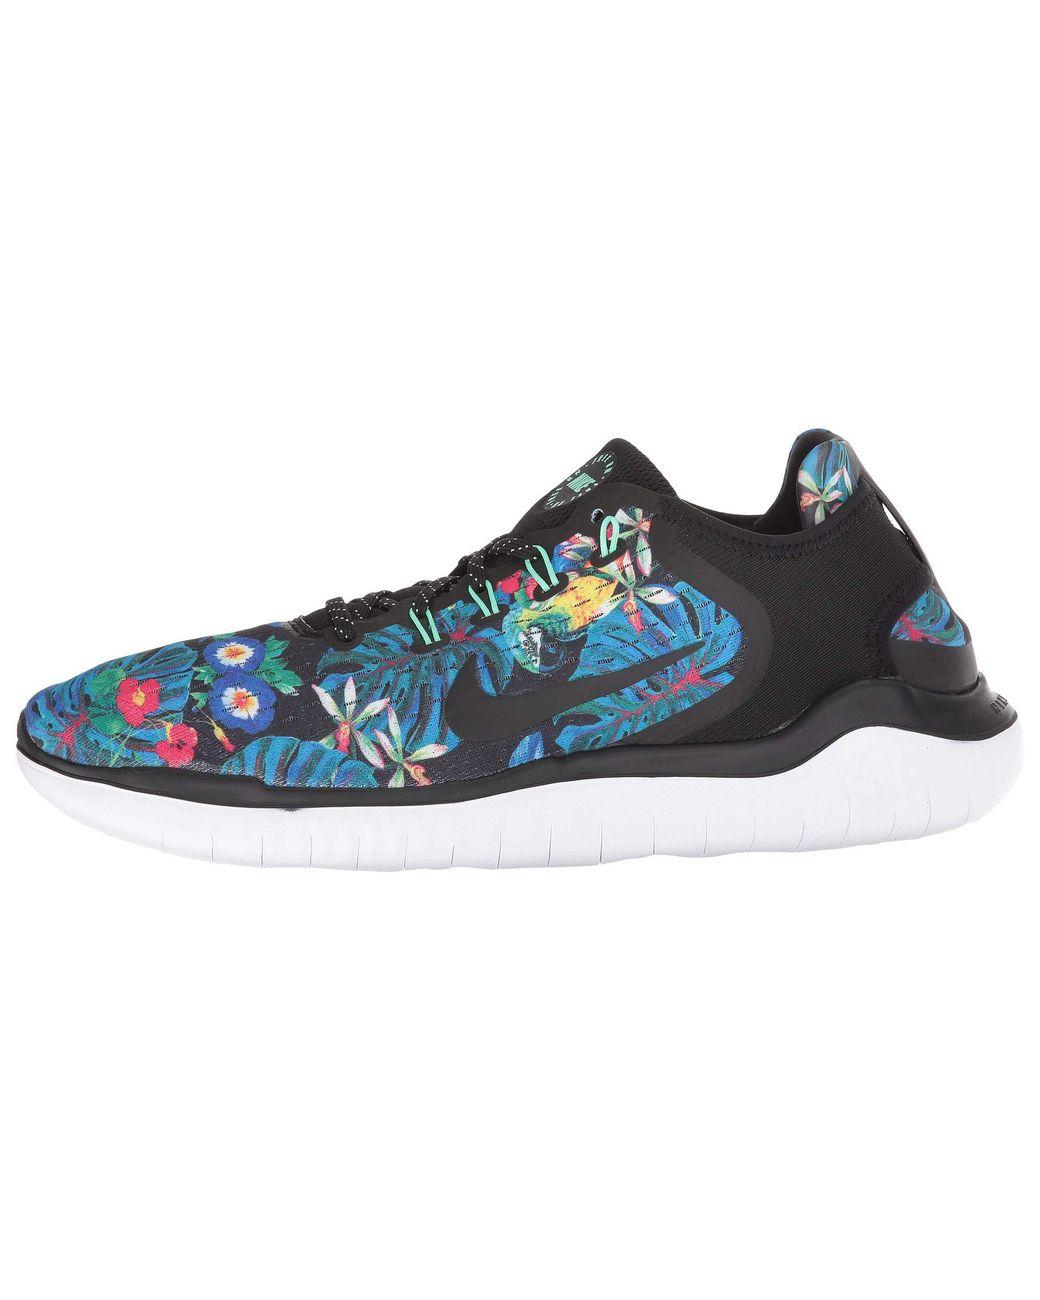 de079a189491 Lyst - Nike Free Rn 2018 Gpx Rs (black black white) Men s Running Shoes in  Black for Men